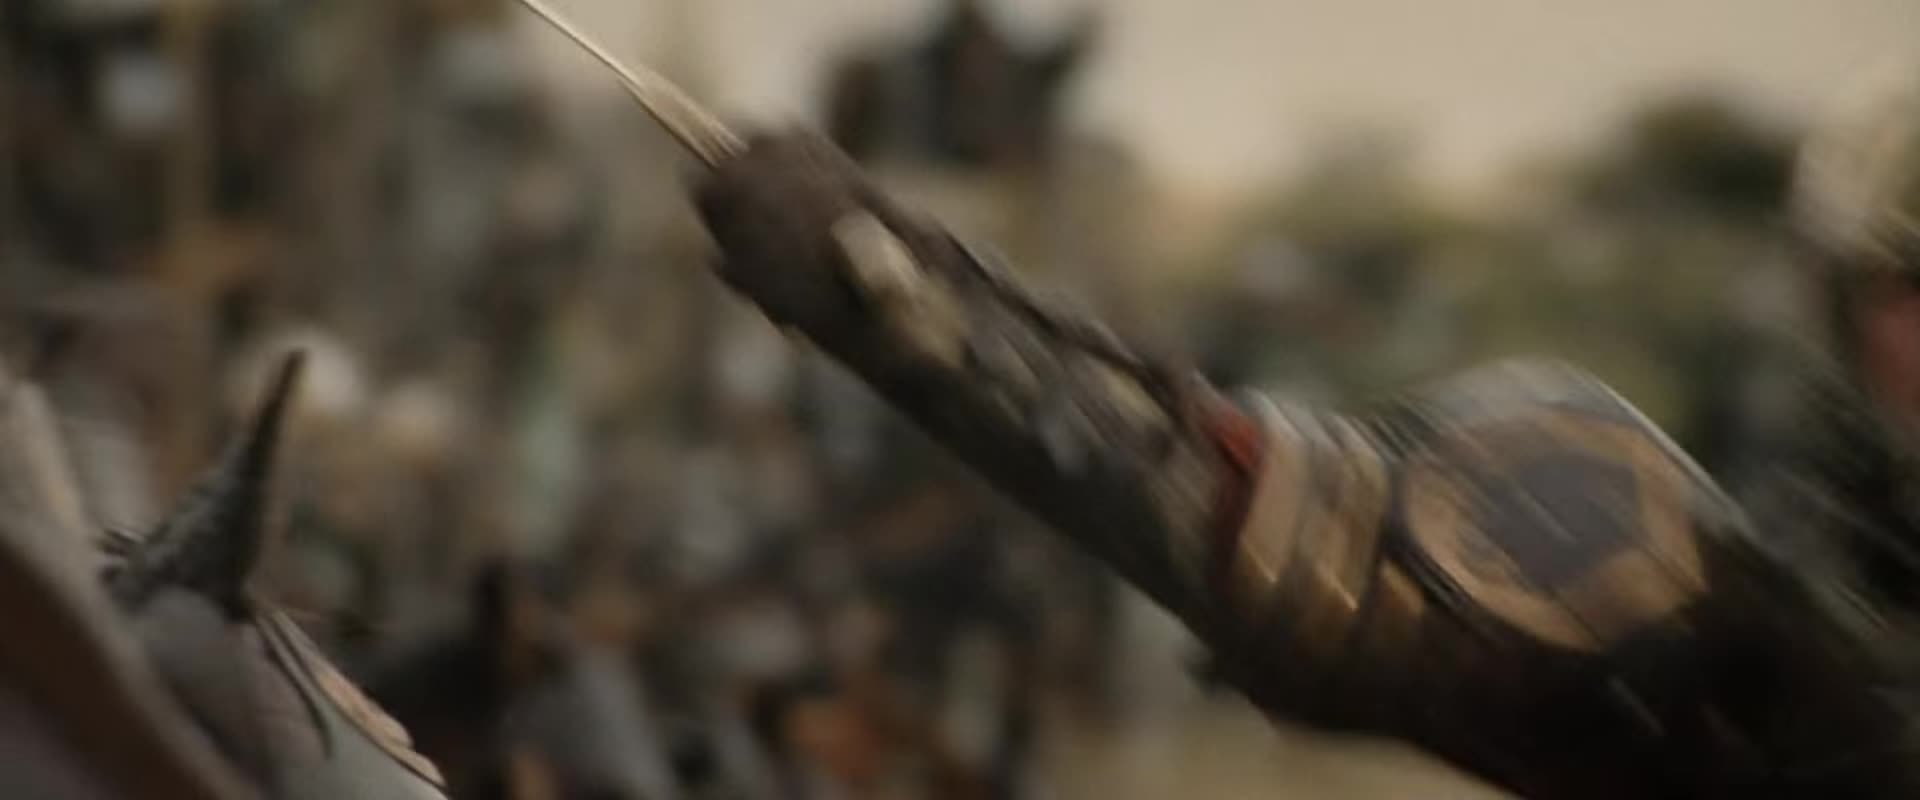 mountandblade, Death! GIFs